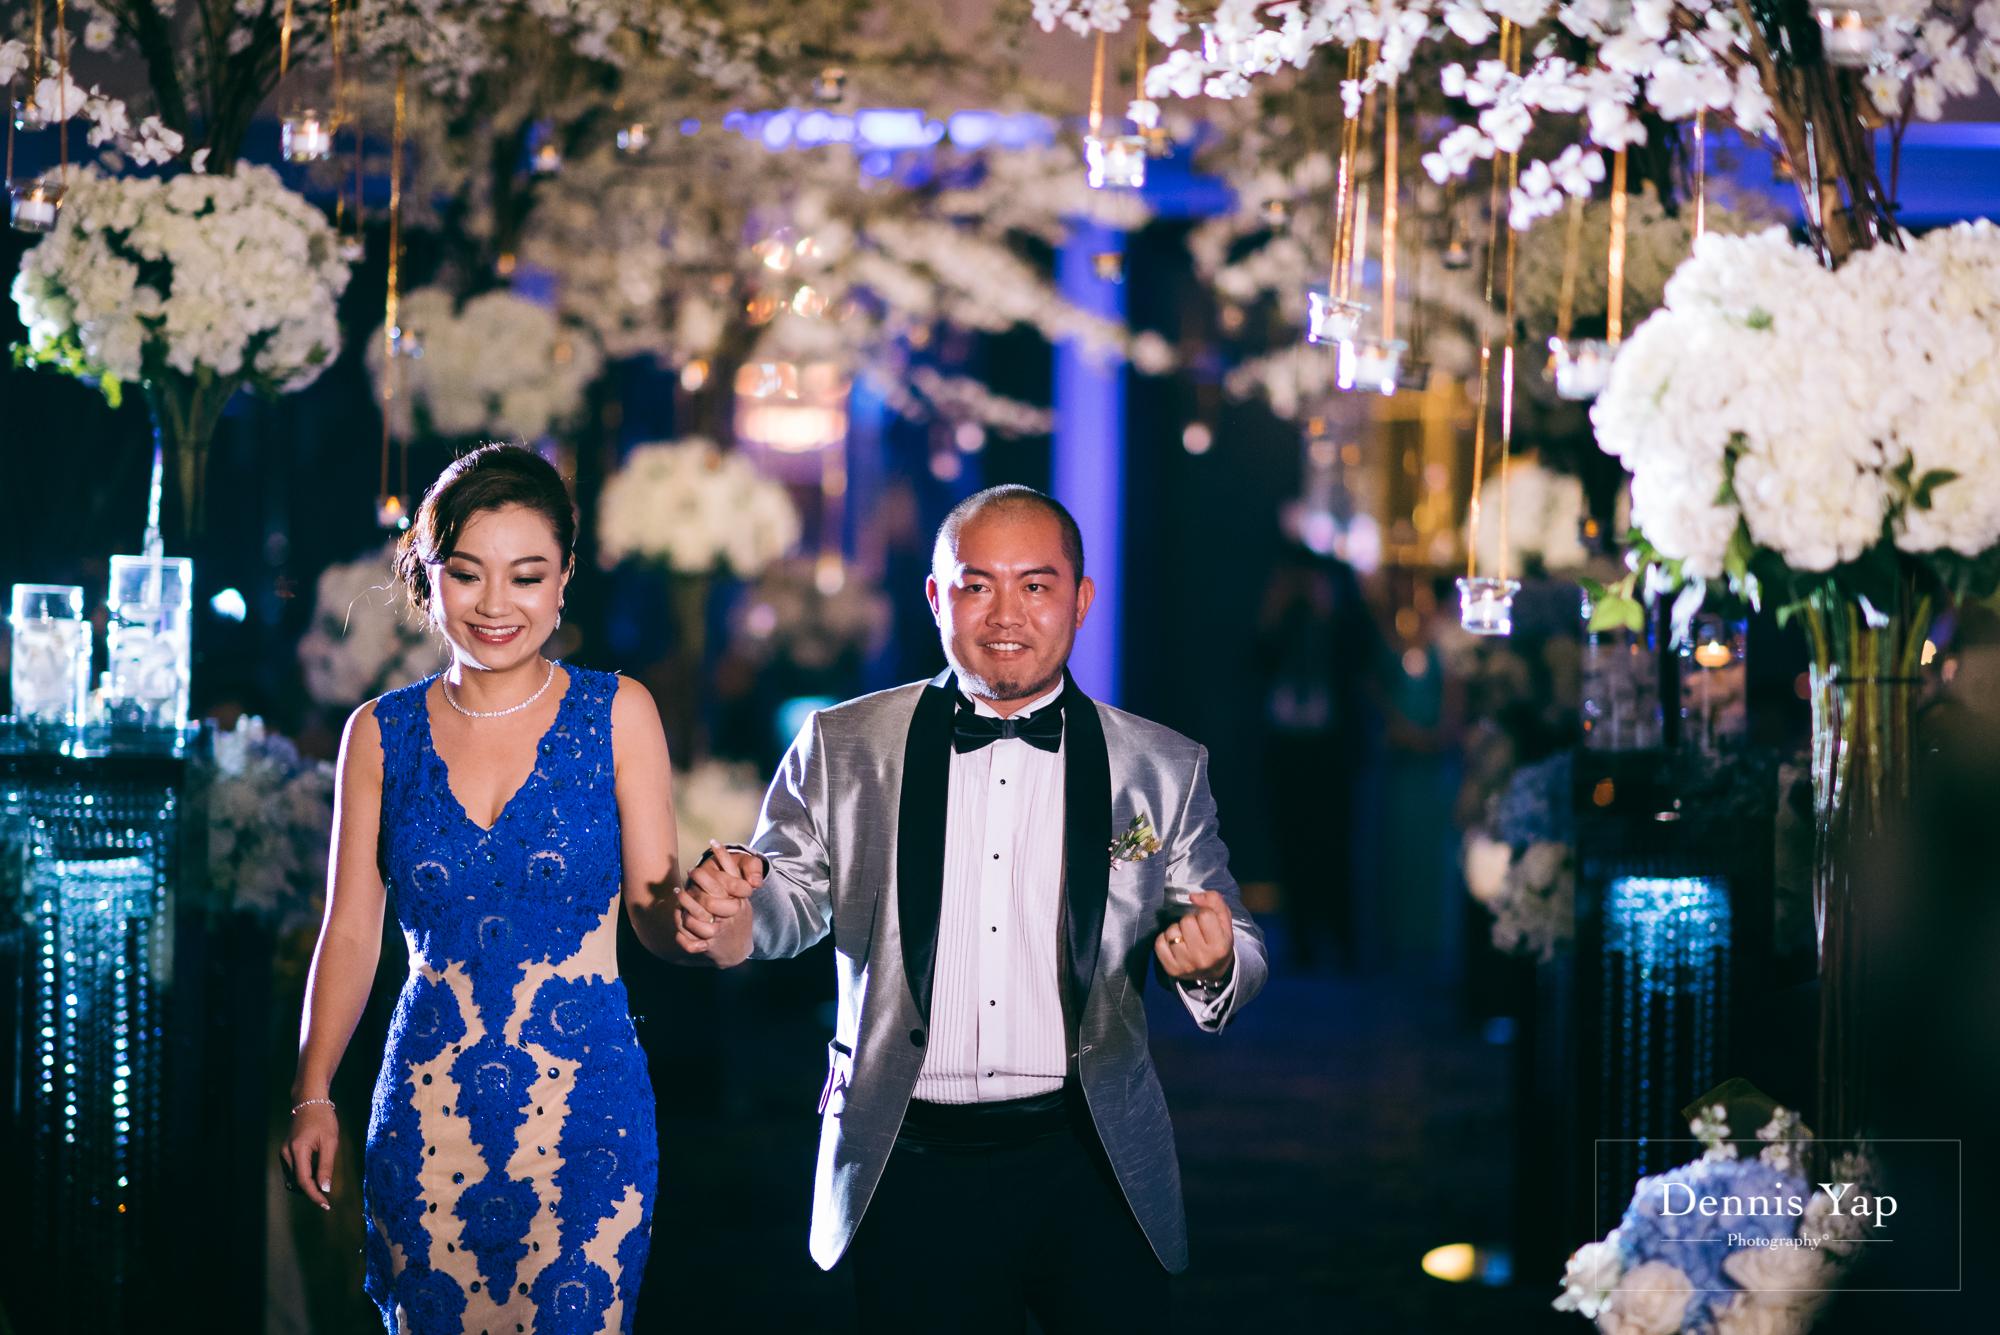 we chard sharon wedding day gate crash majestic hotel kuala lumpur moonlight dennis yap photography malaysia-45.jpg